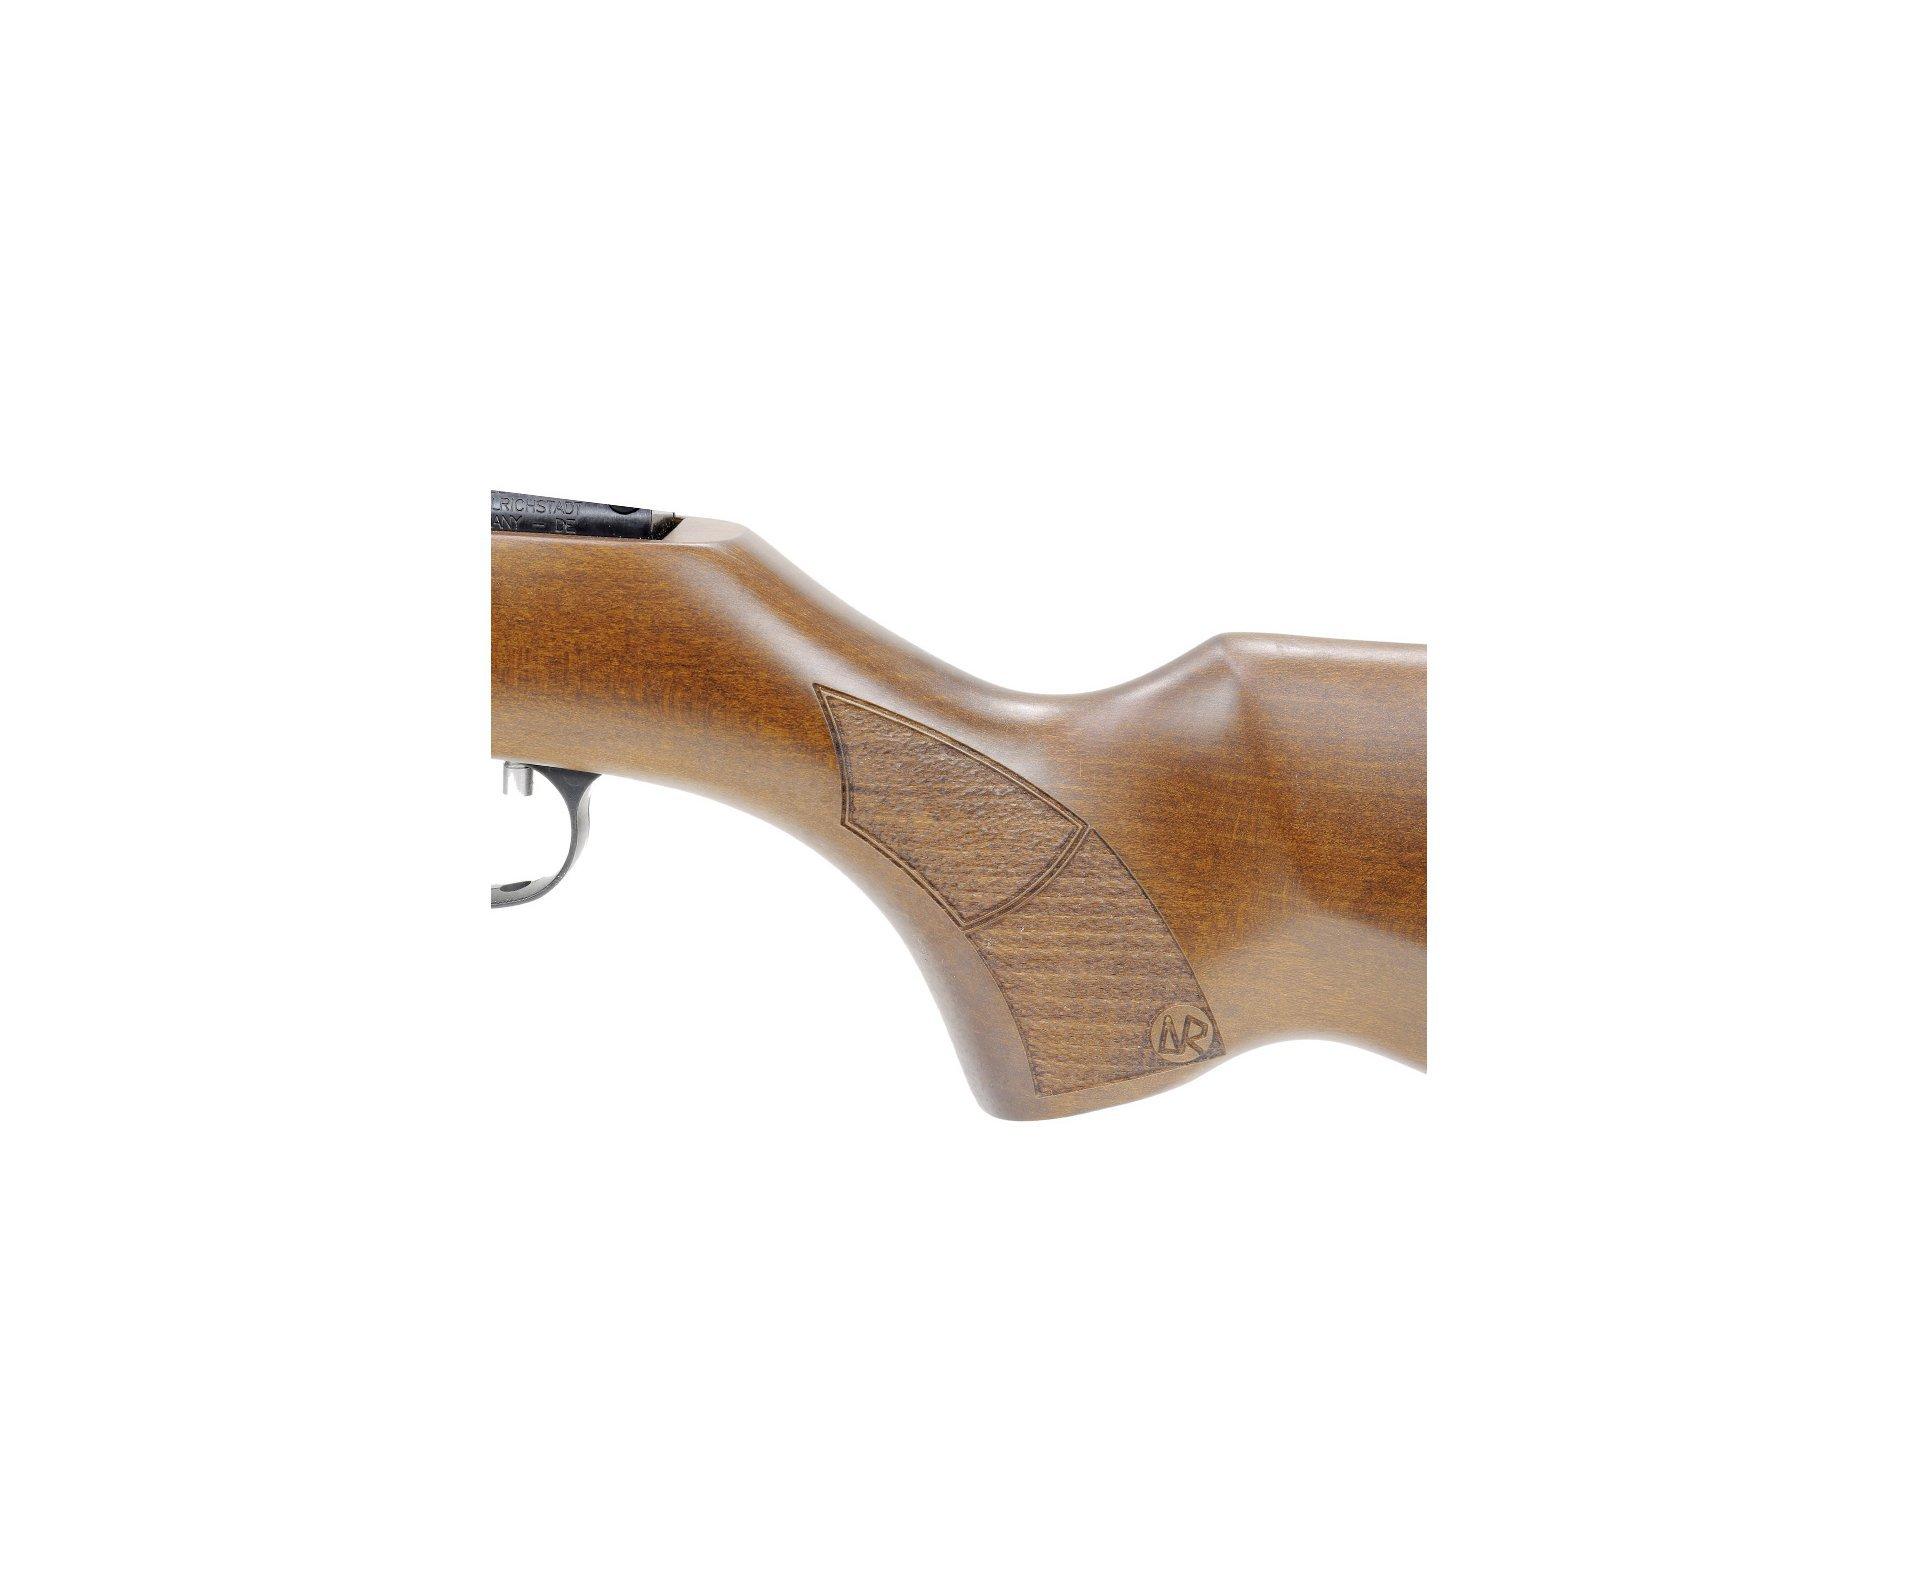 Carabina De Pressão Hw-50 - Cal 5,5mm - Weihrauch